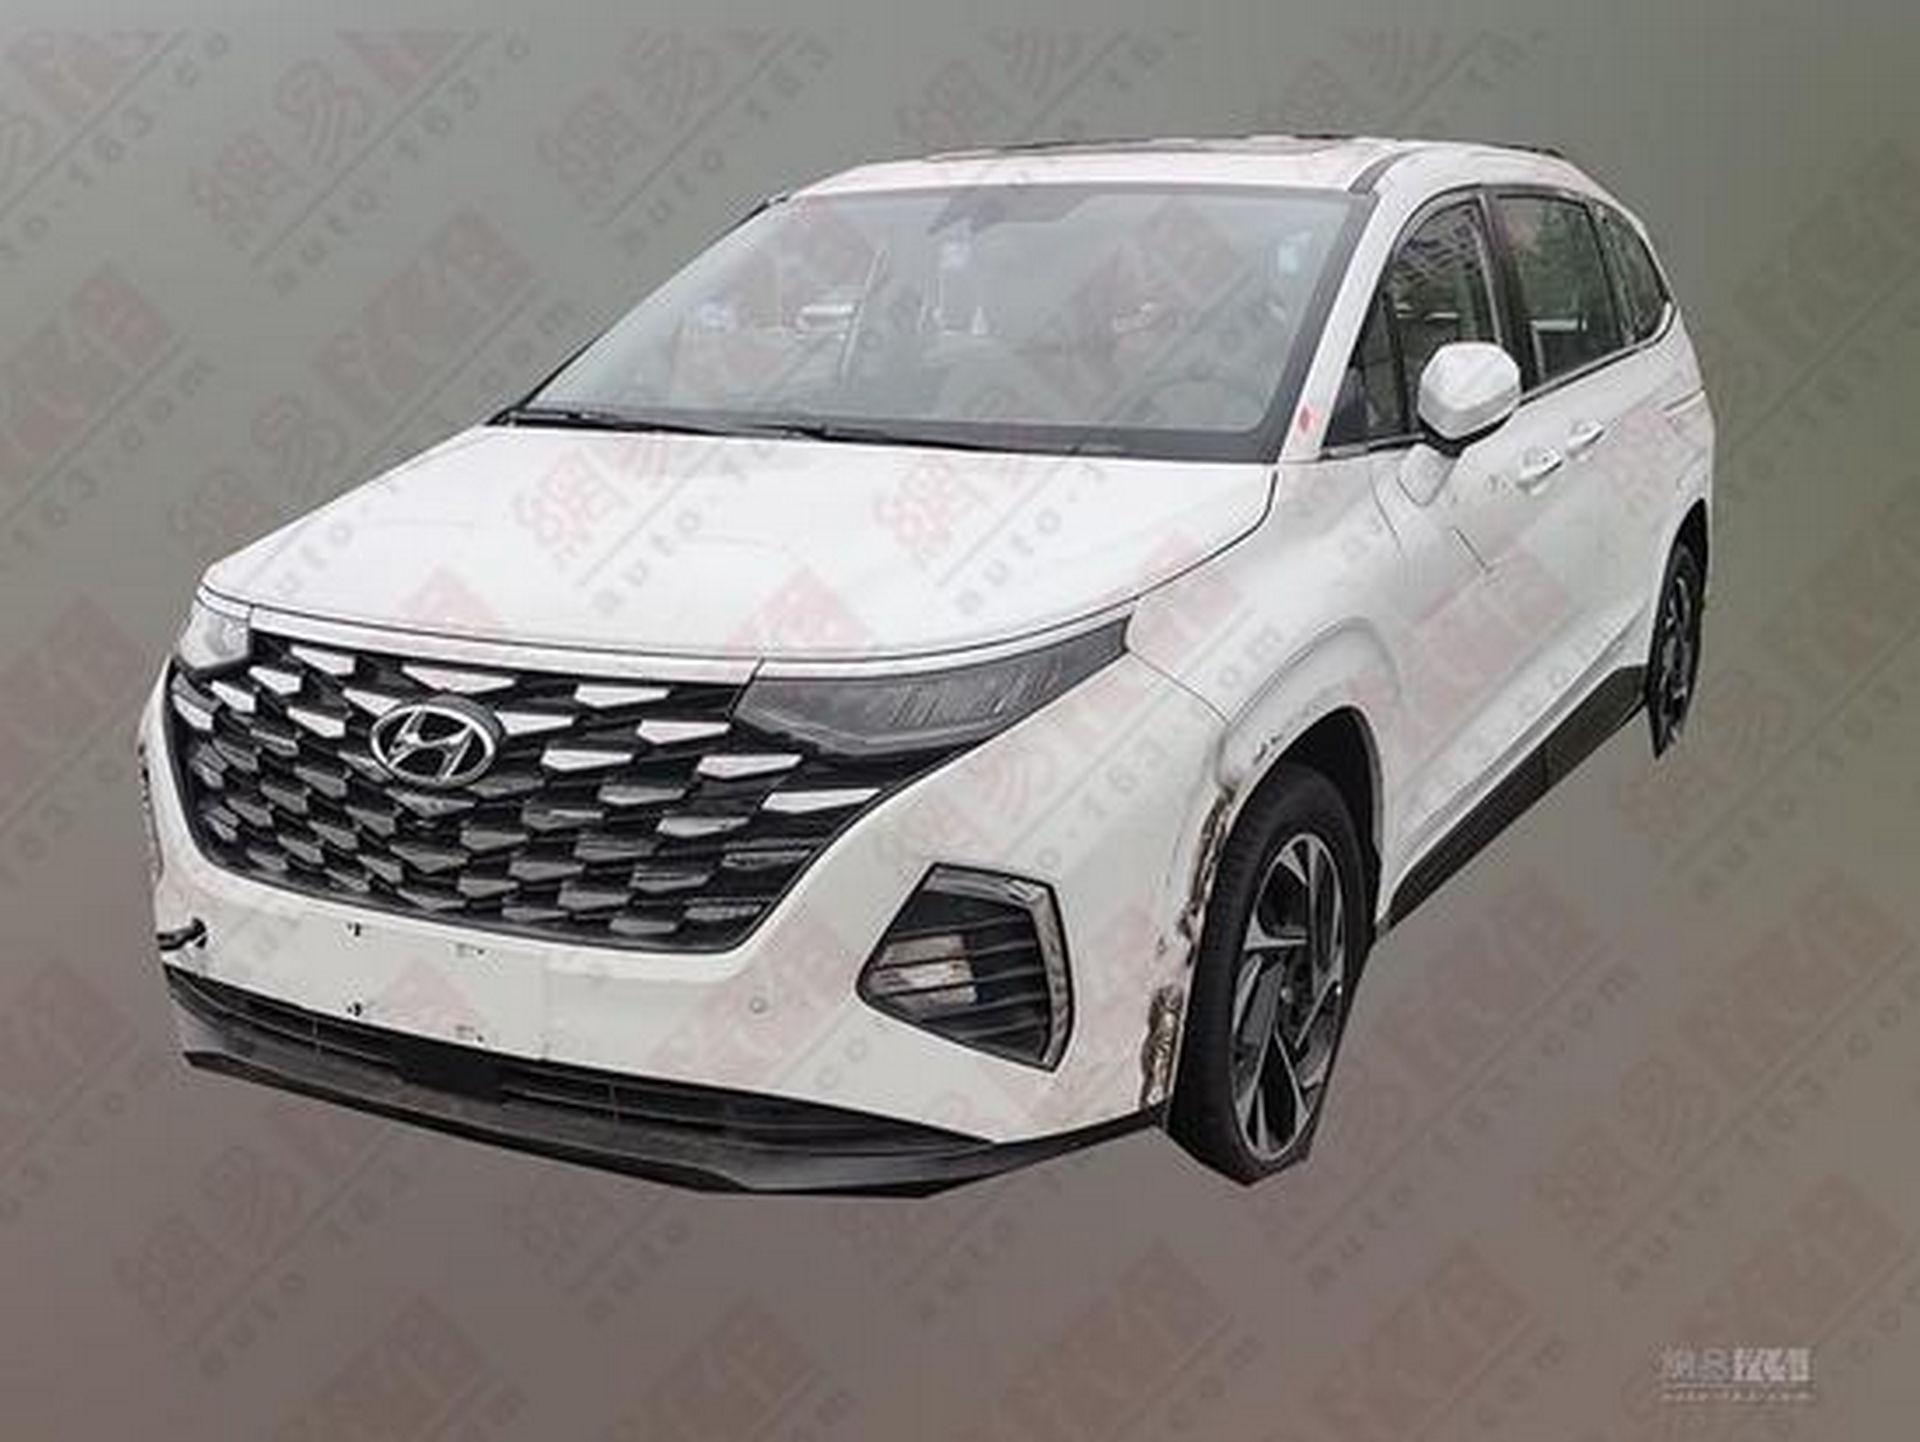 Hyundai_Custo_leaked_0004